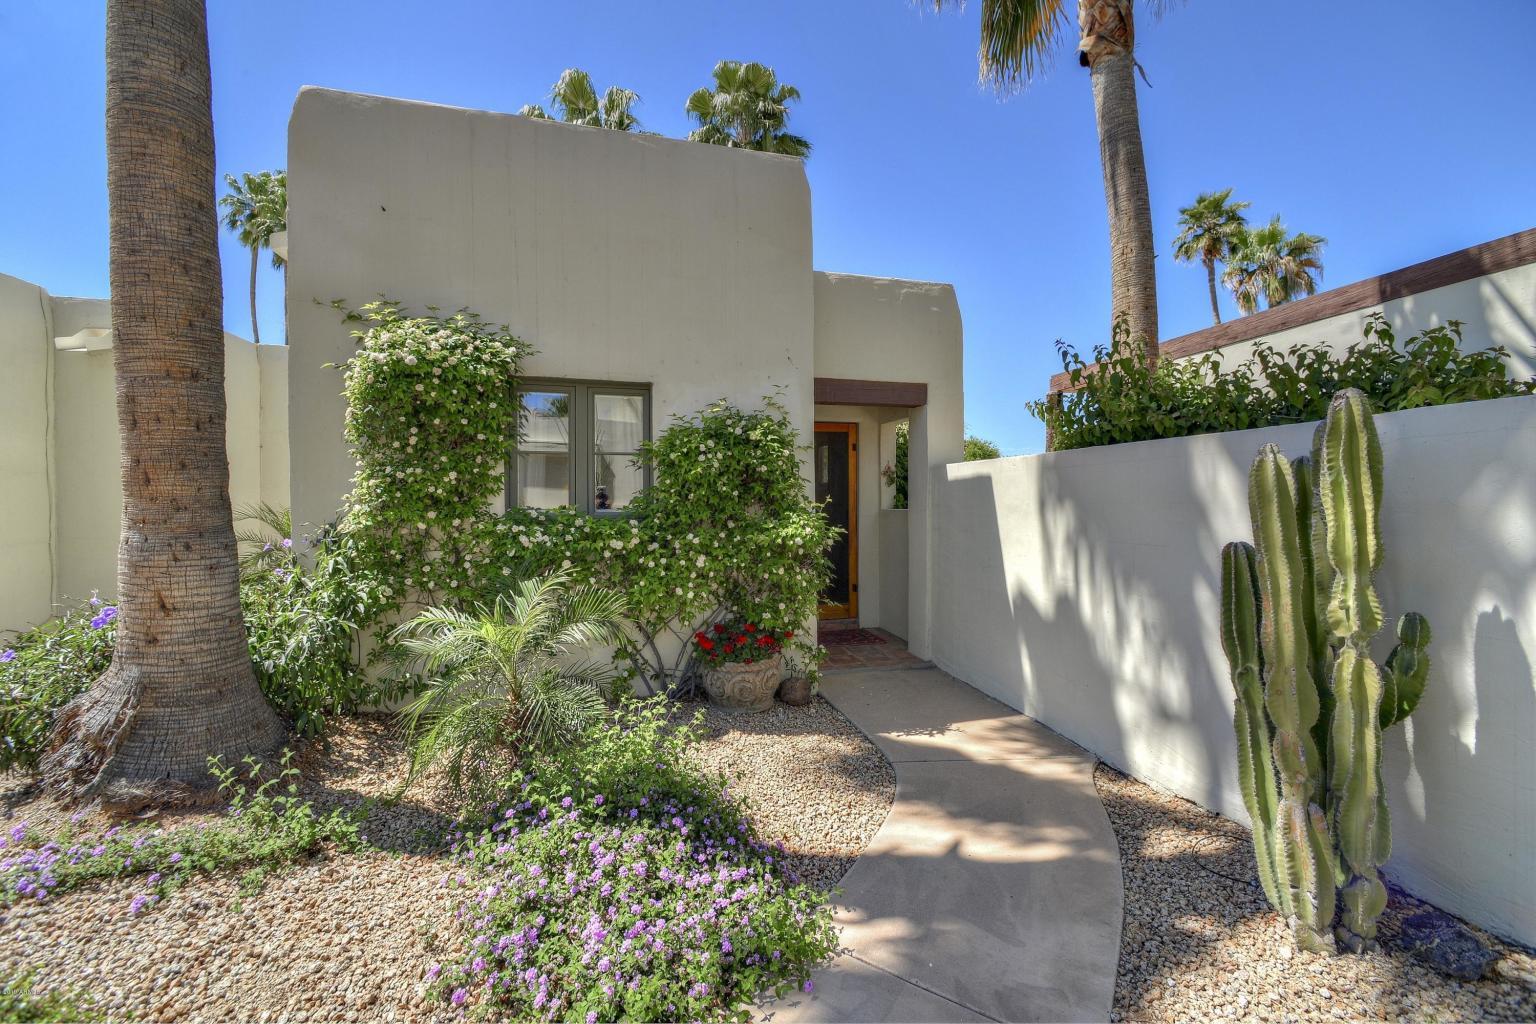 5101 N Casa Blanca Dr 5, Paradise Valley | $485,000